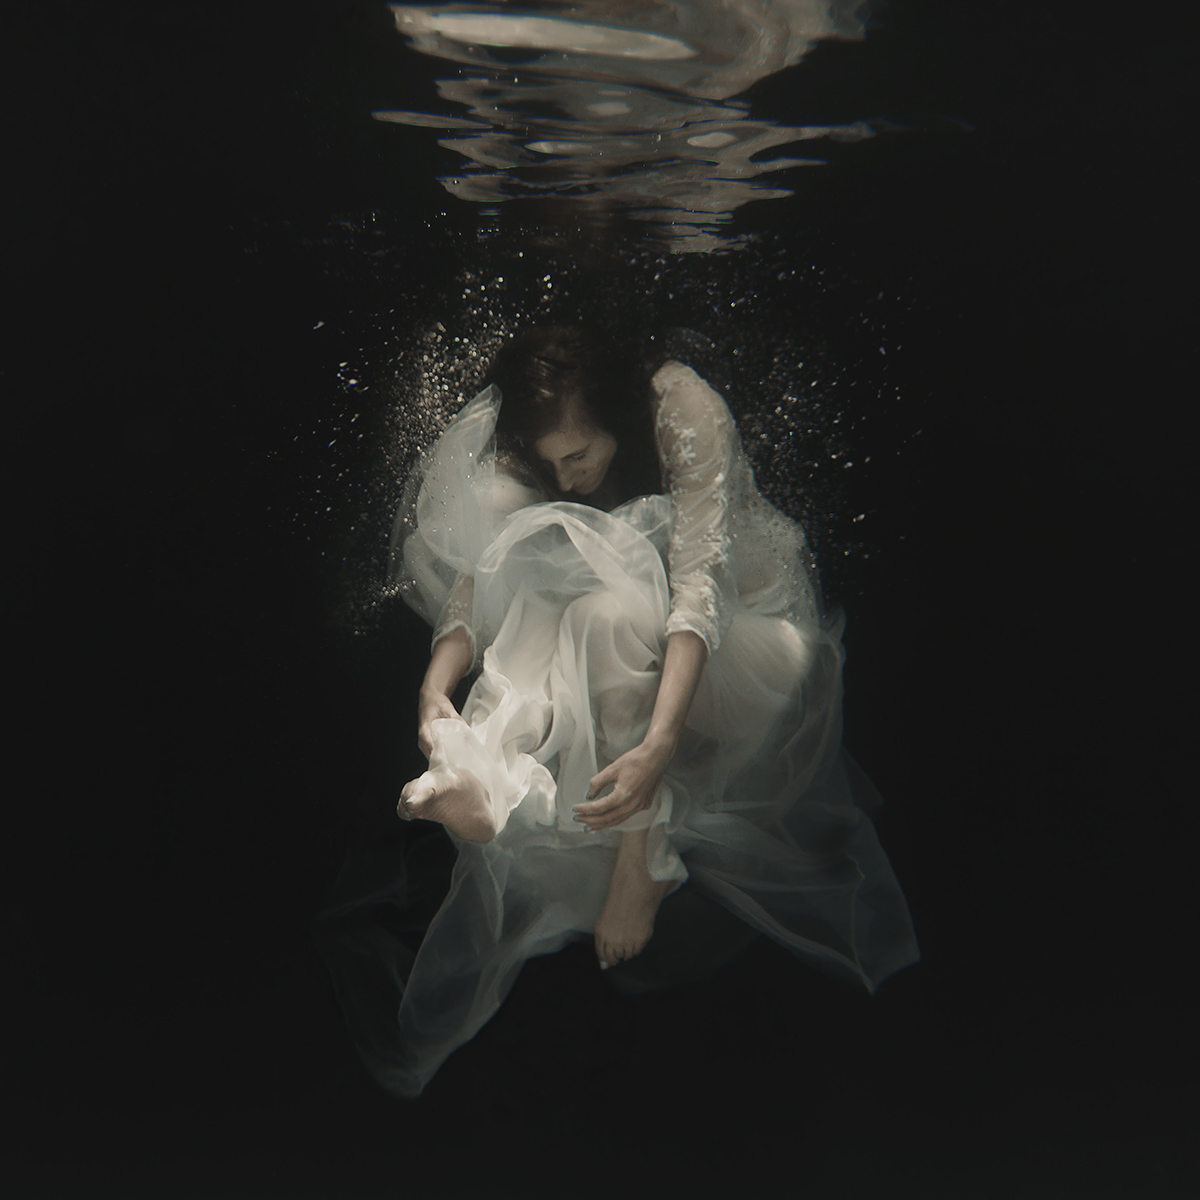 Nathan Milner Photography (ig nathanmilner) - Bridget Claire - Woe